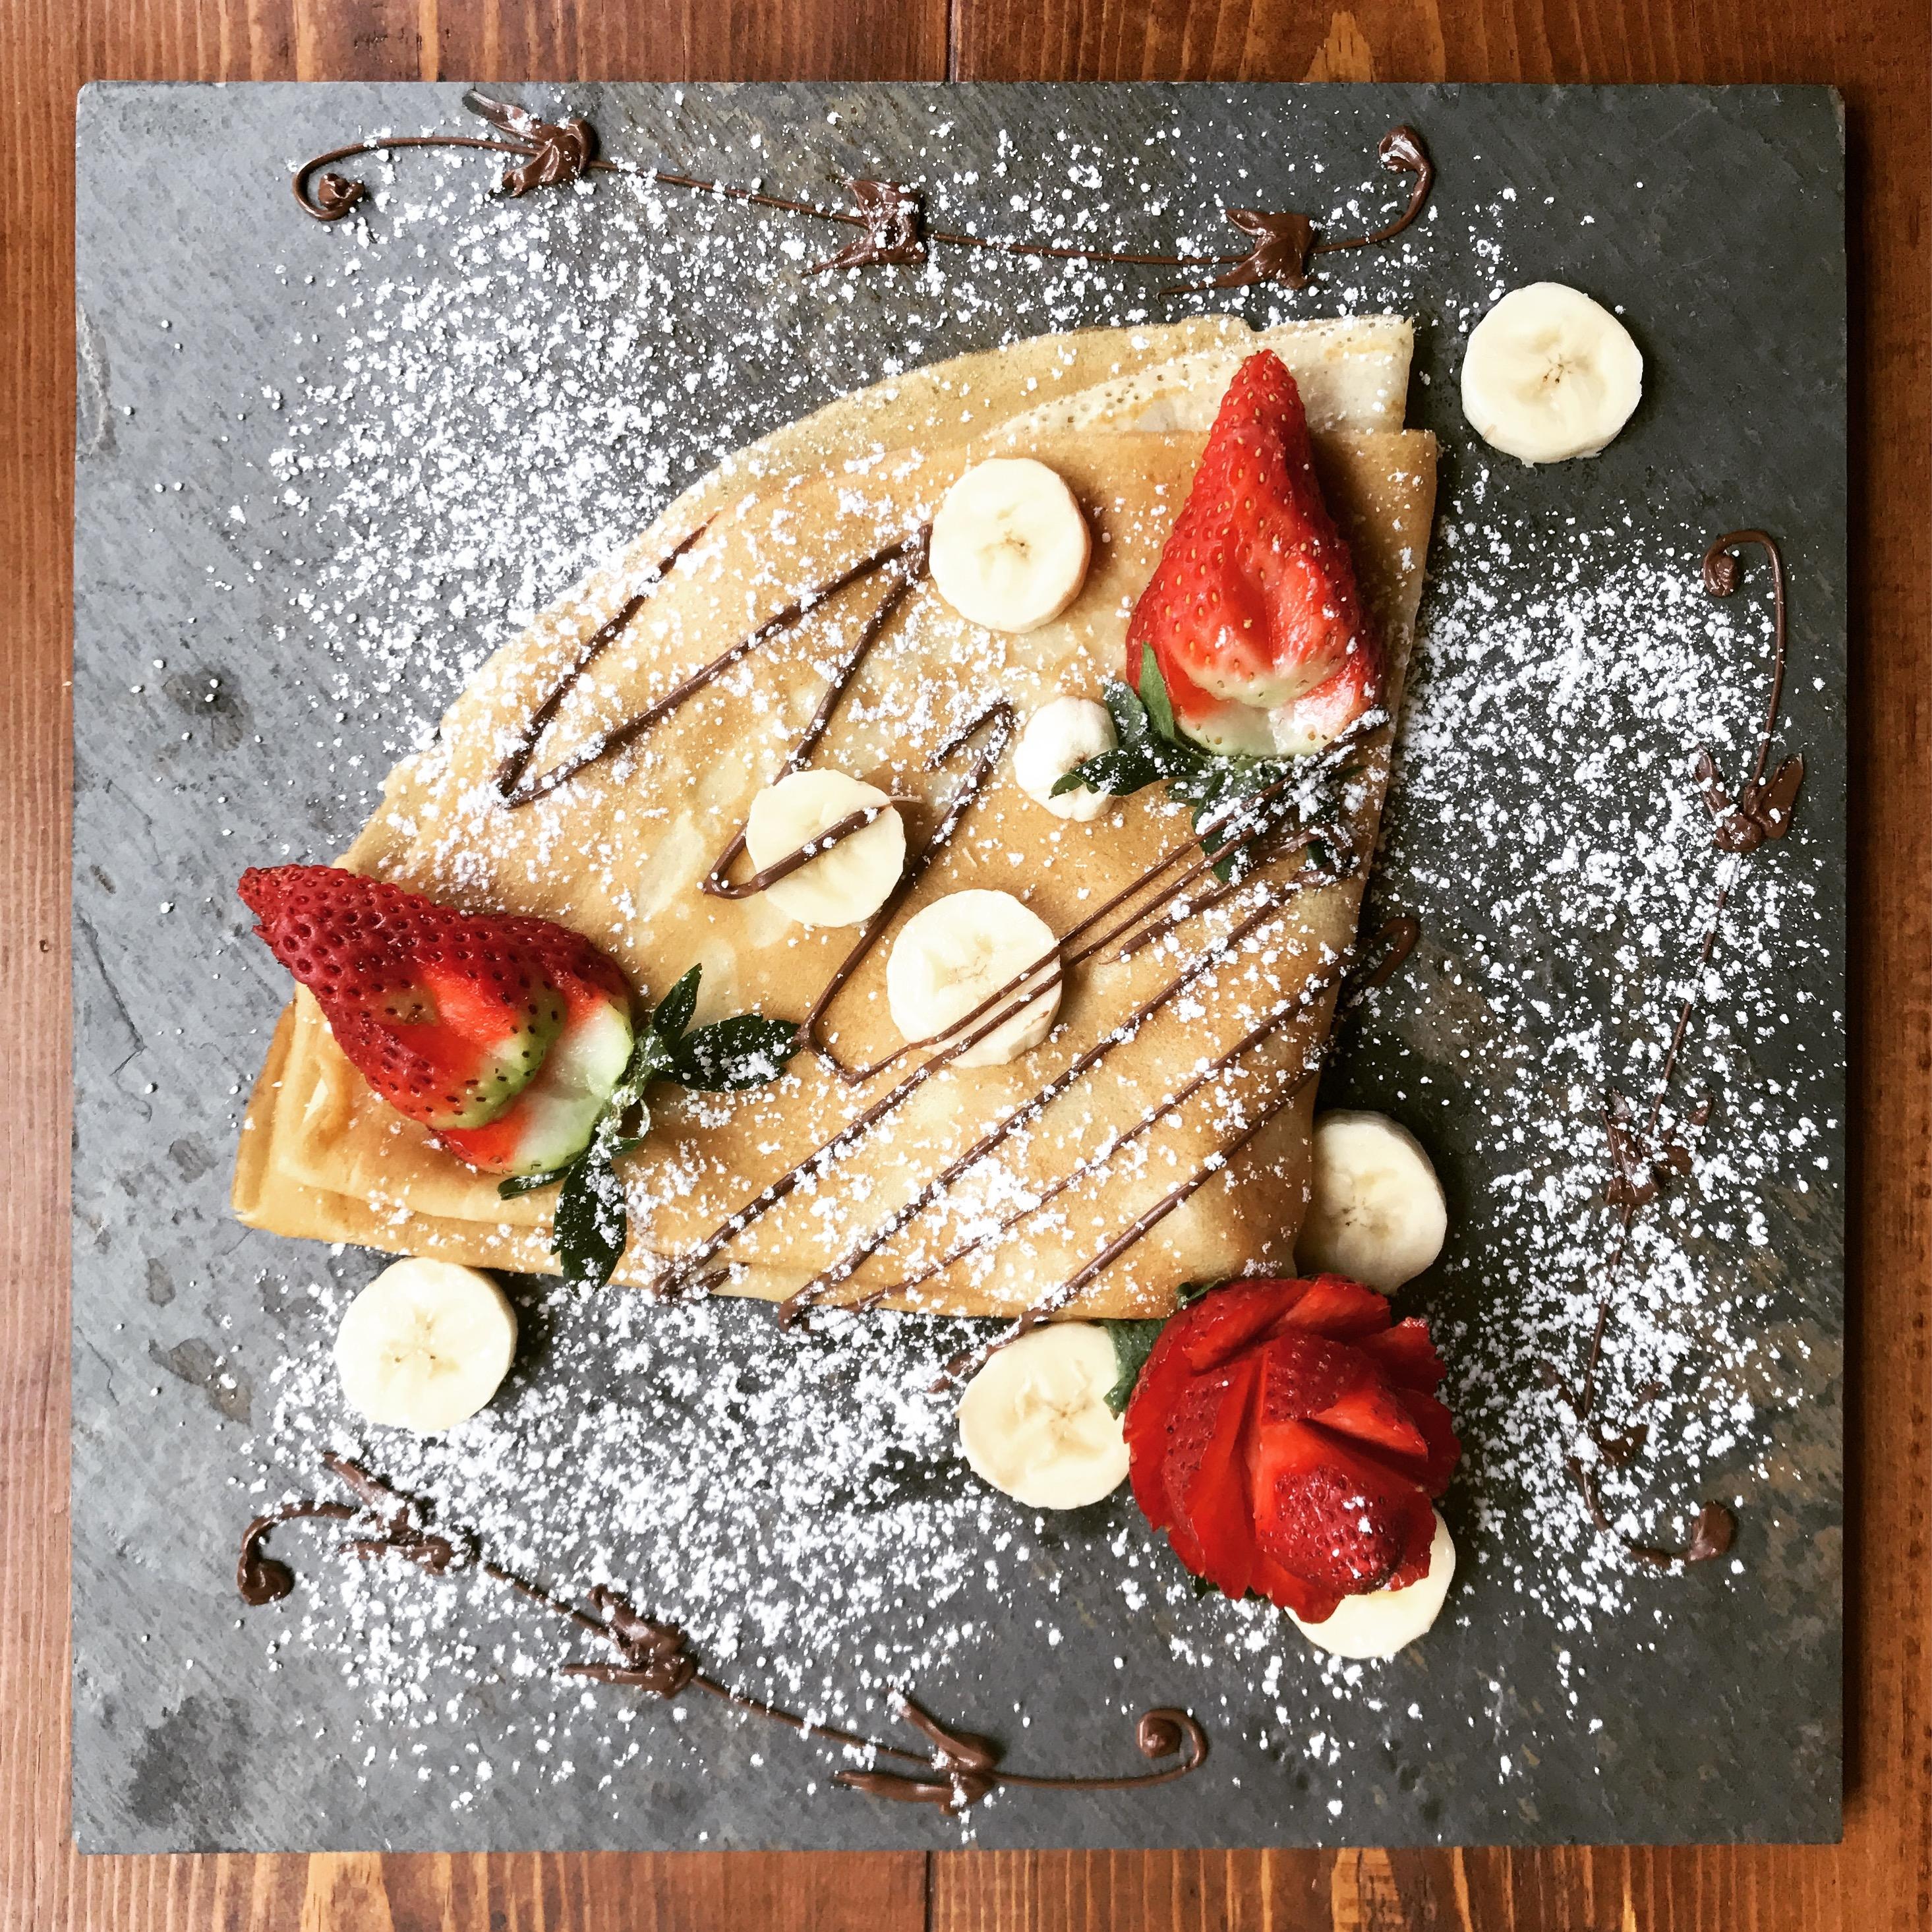 Xielo Artisan Desserts